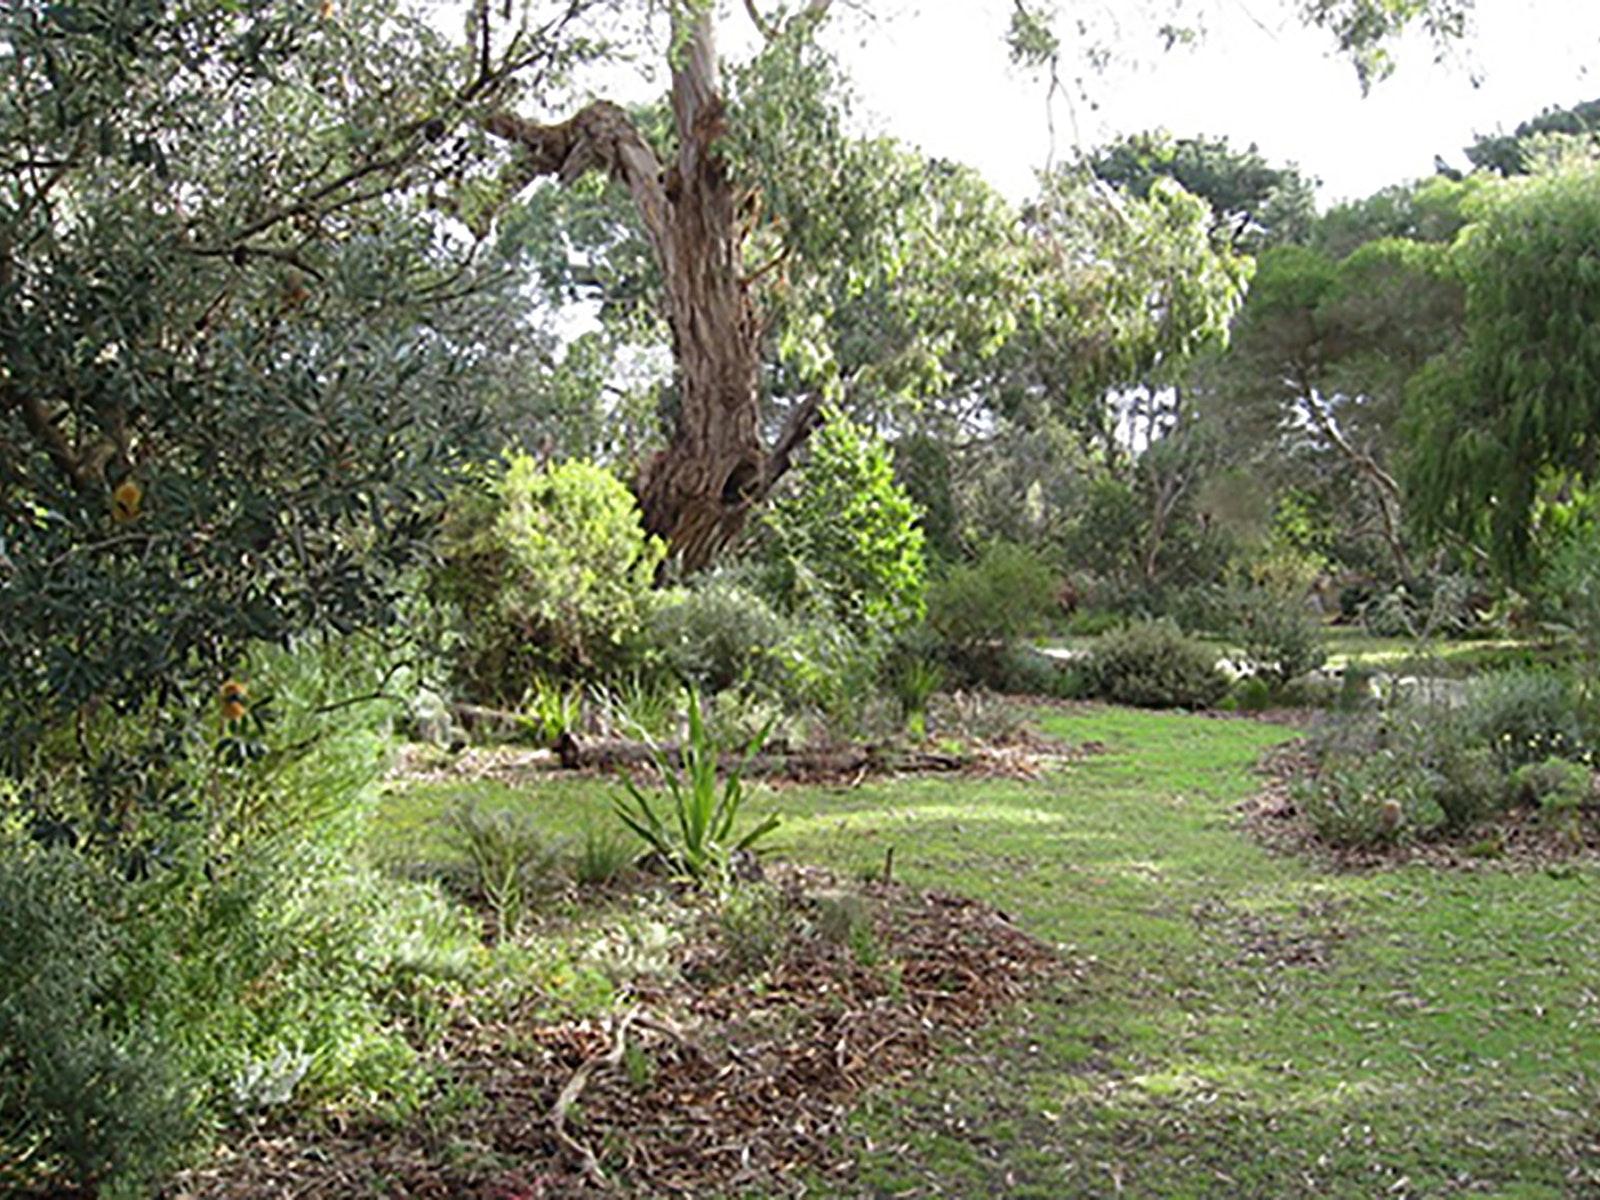 Native foilage and grasses at Illabunda